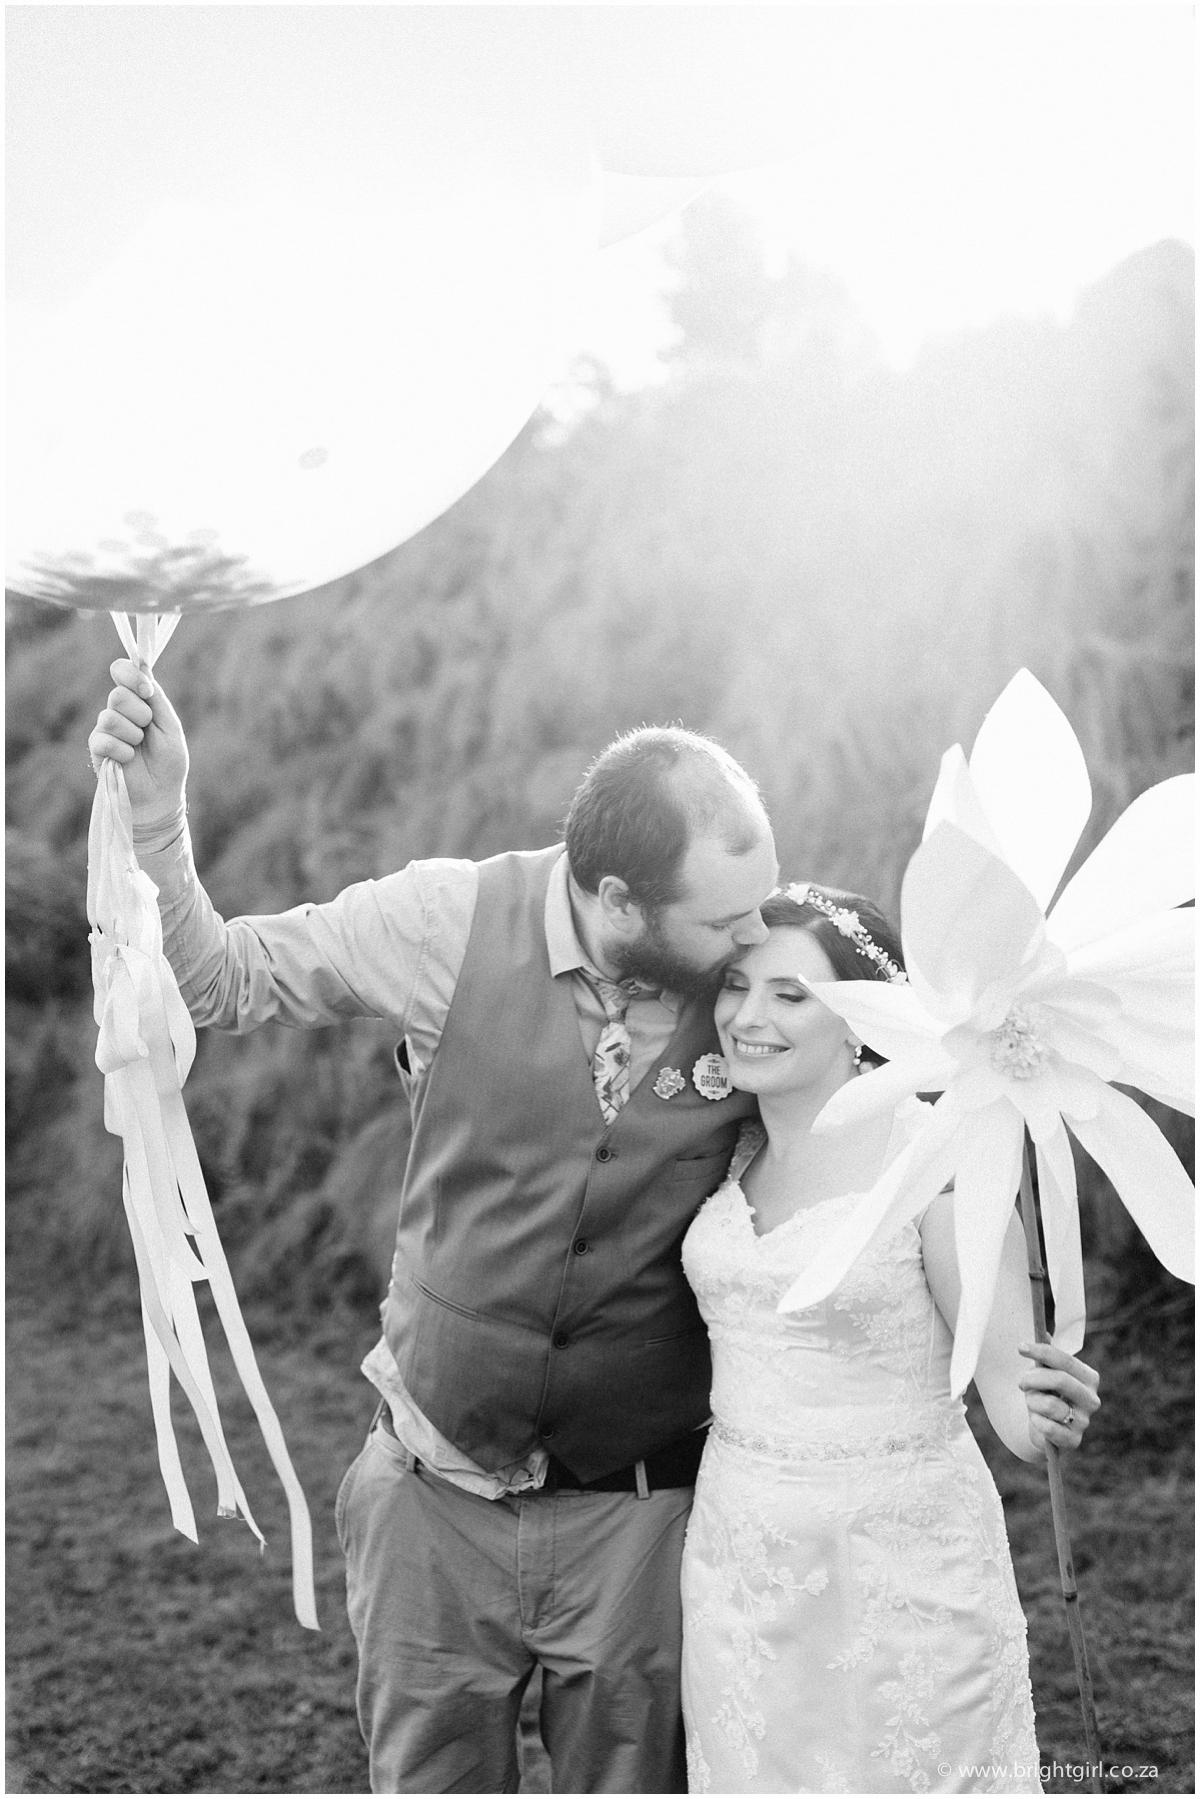 brightgirl_talloula_wedding53